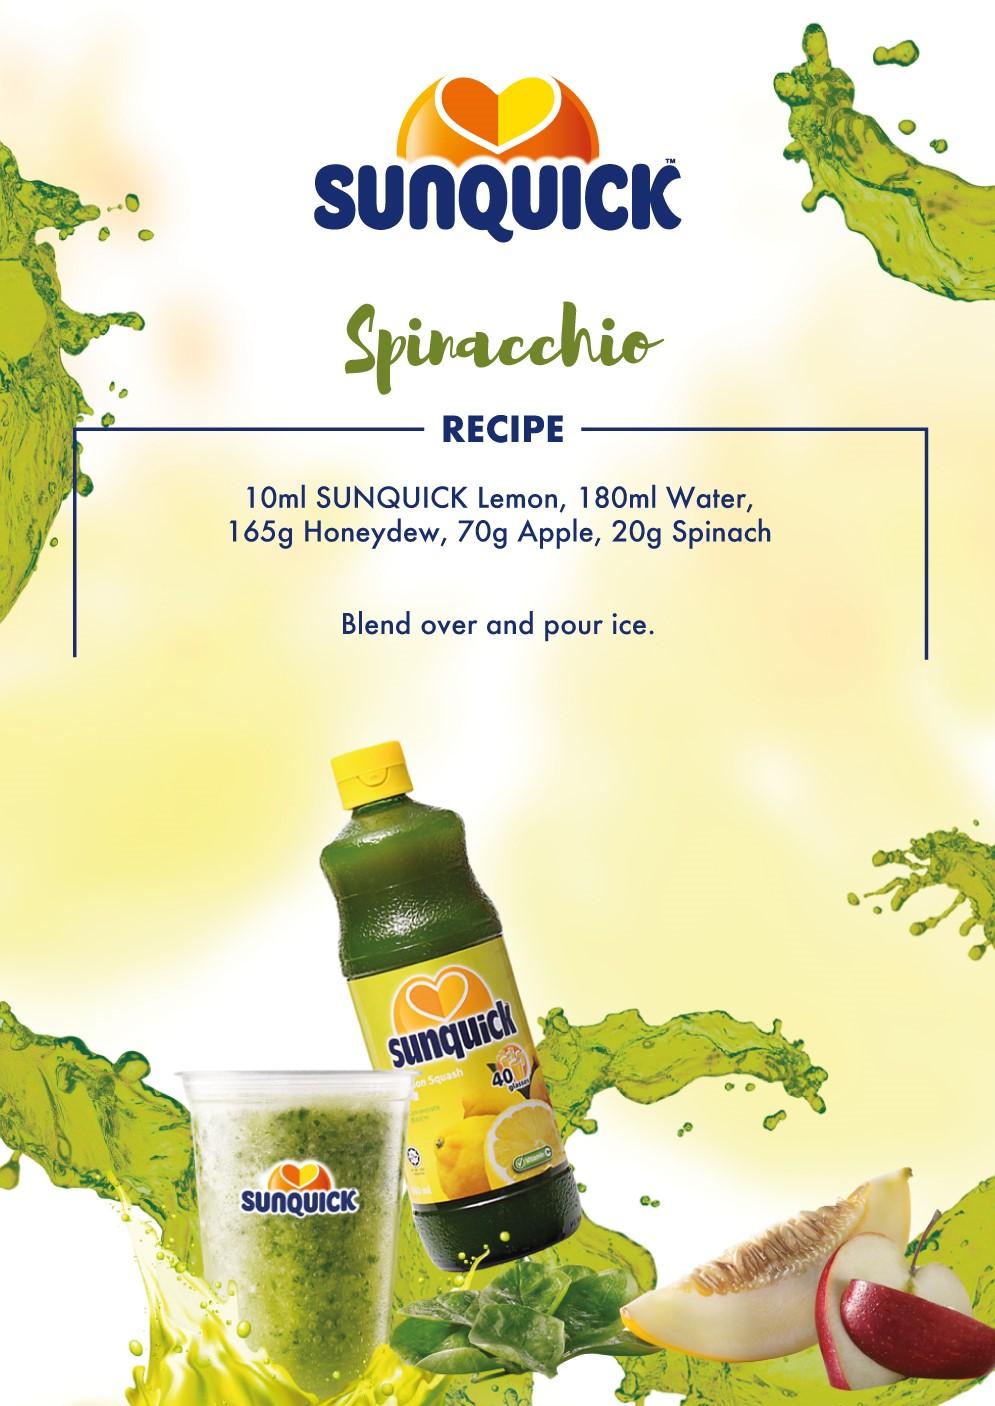 Sunquick spinacchio recipe  banner.jpg